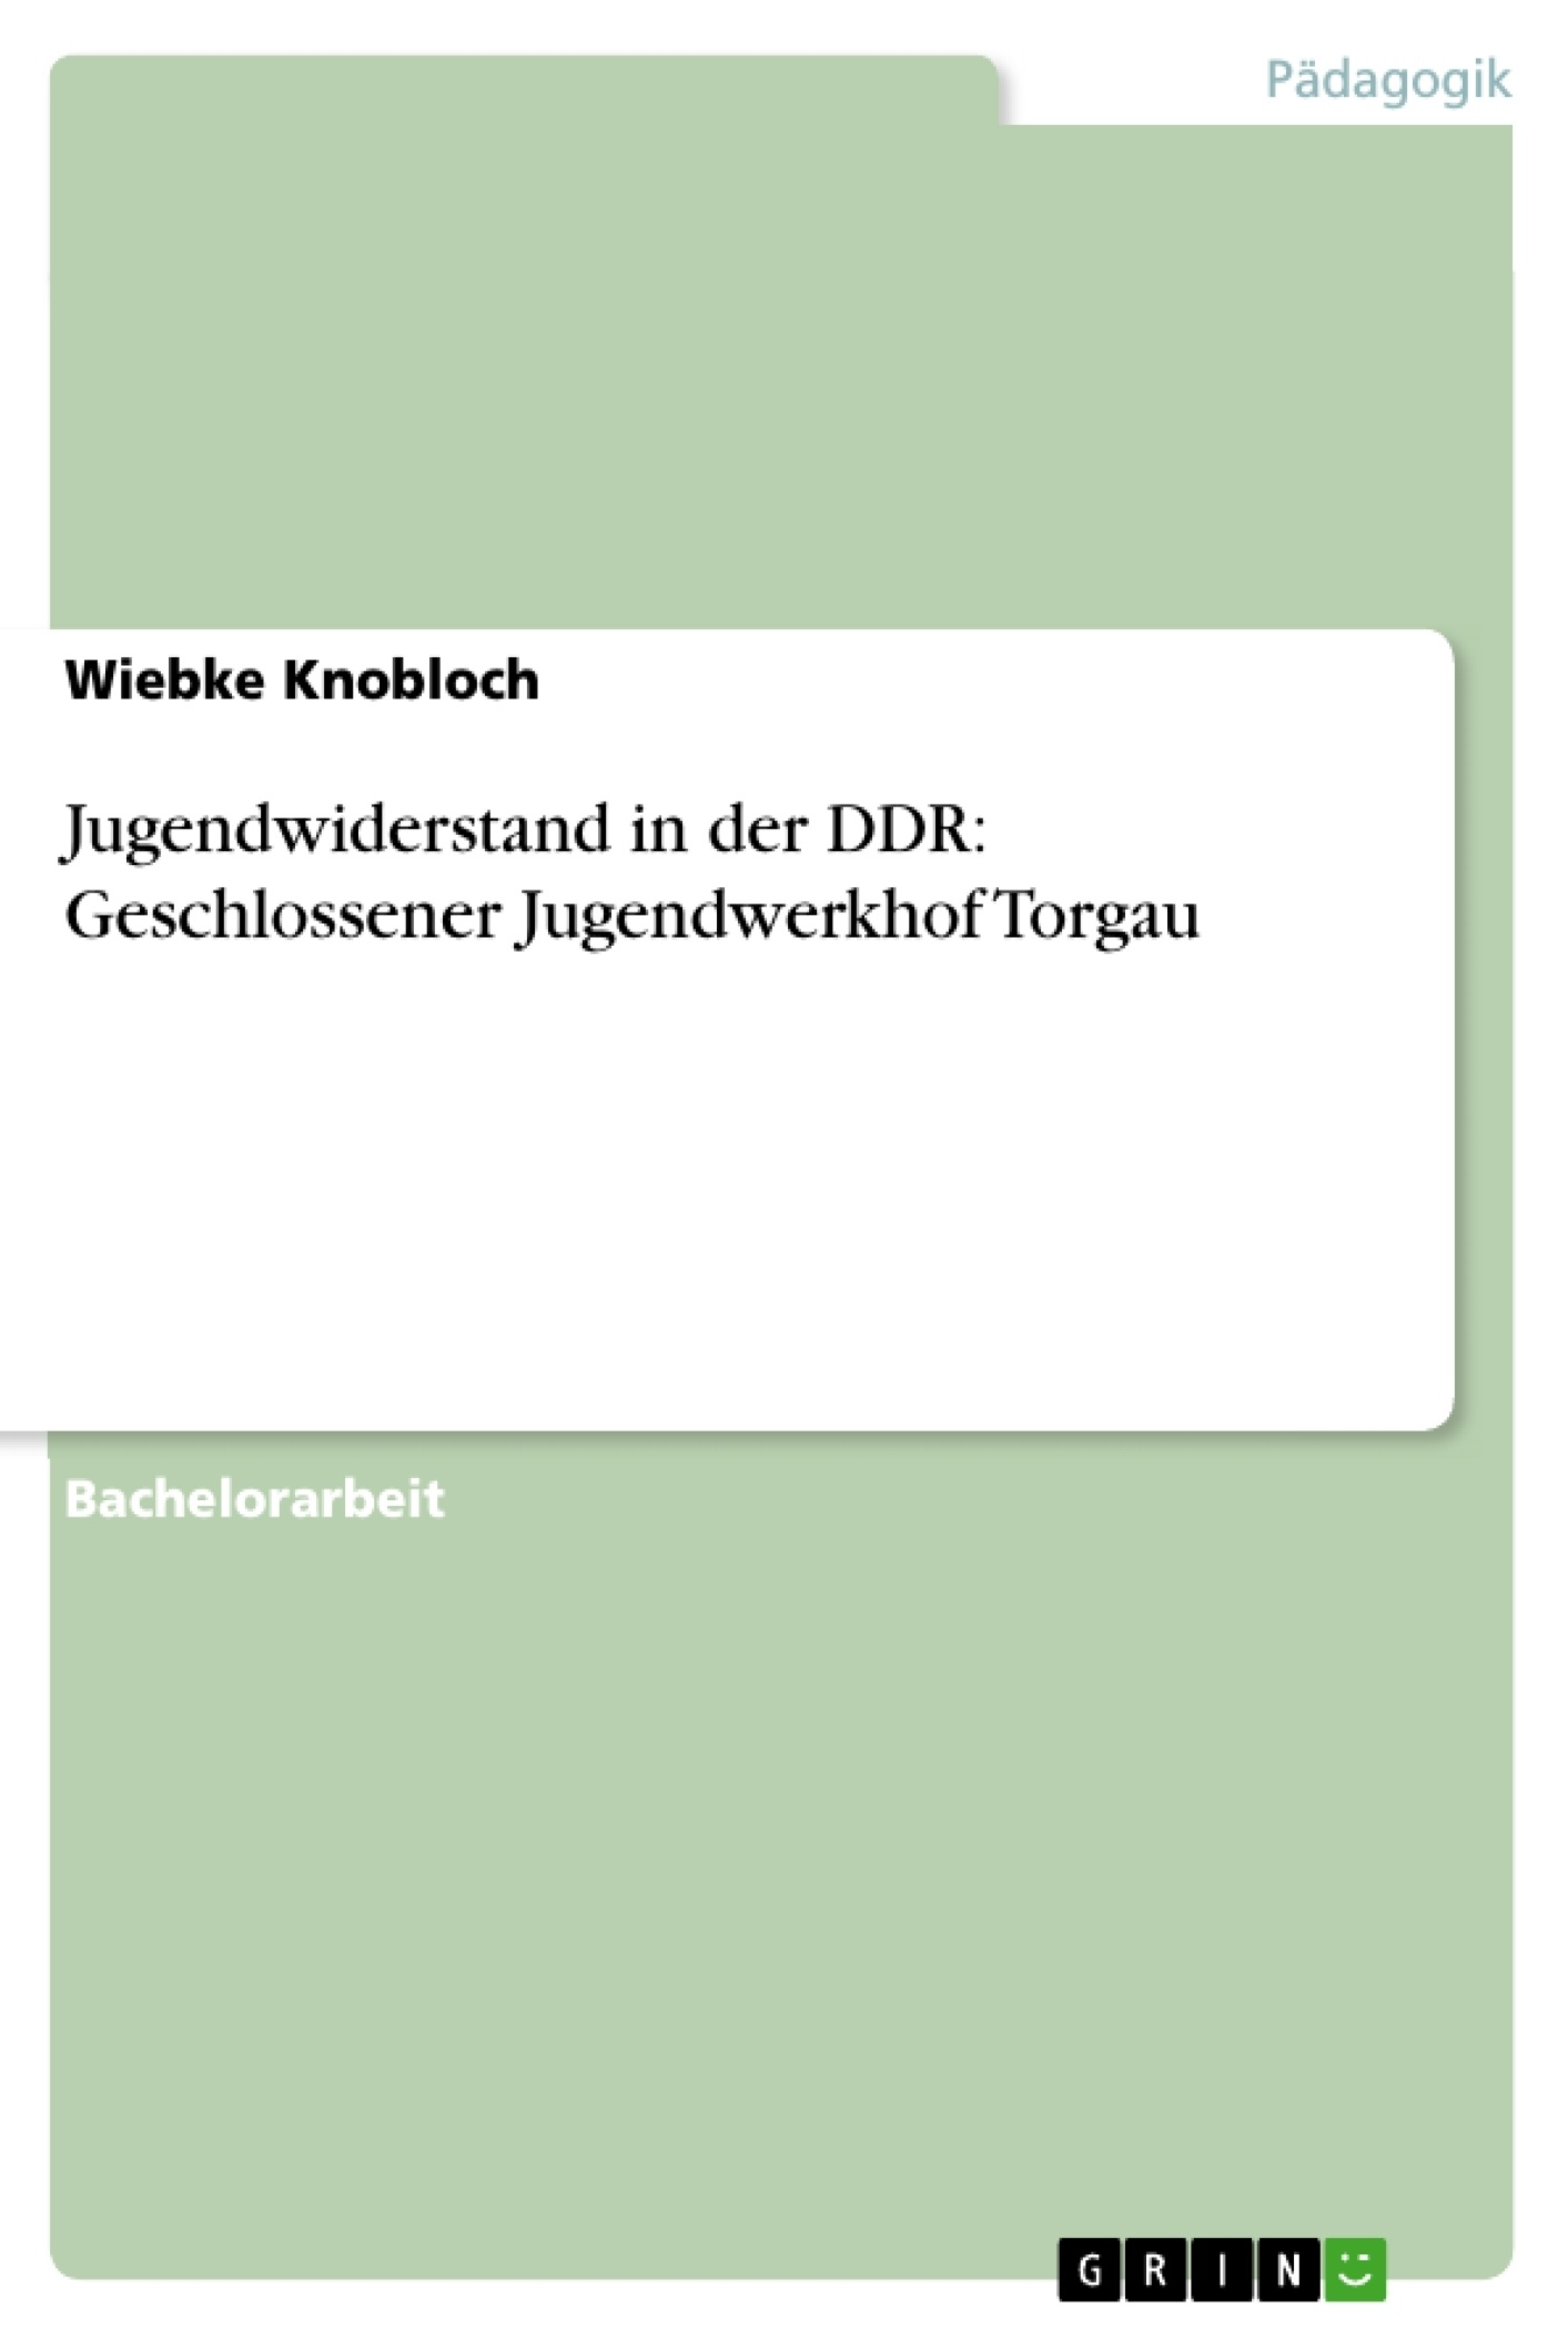 Titel: Jugendwiderstand in der DDR: Geschlossener Jugendwerkhof Torgau